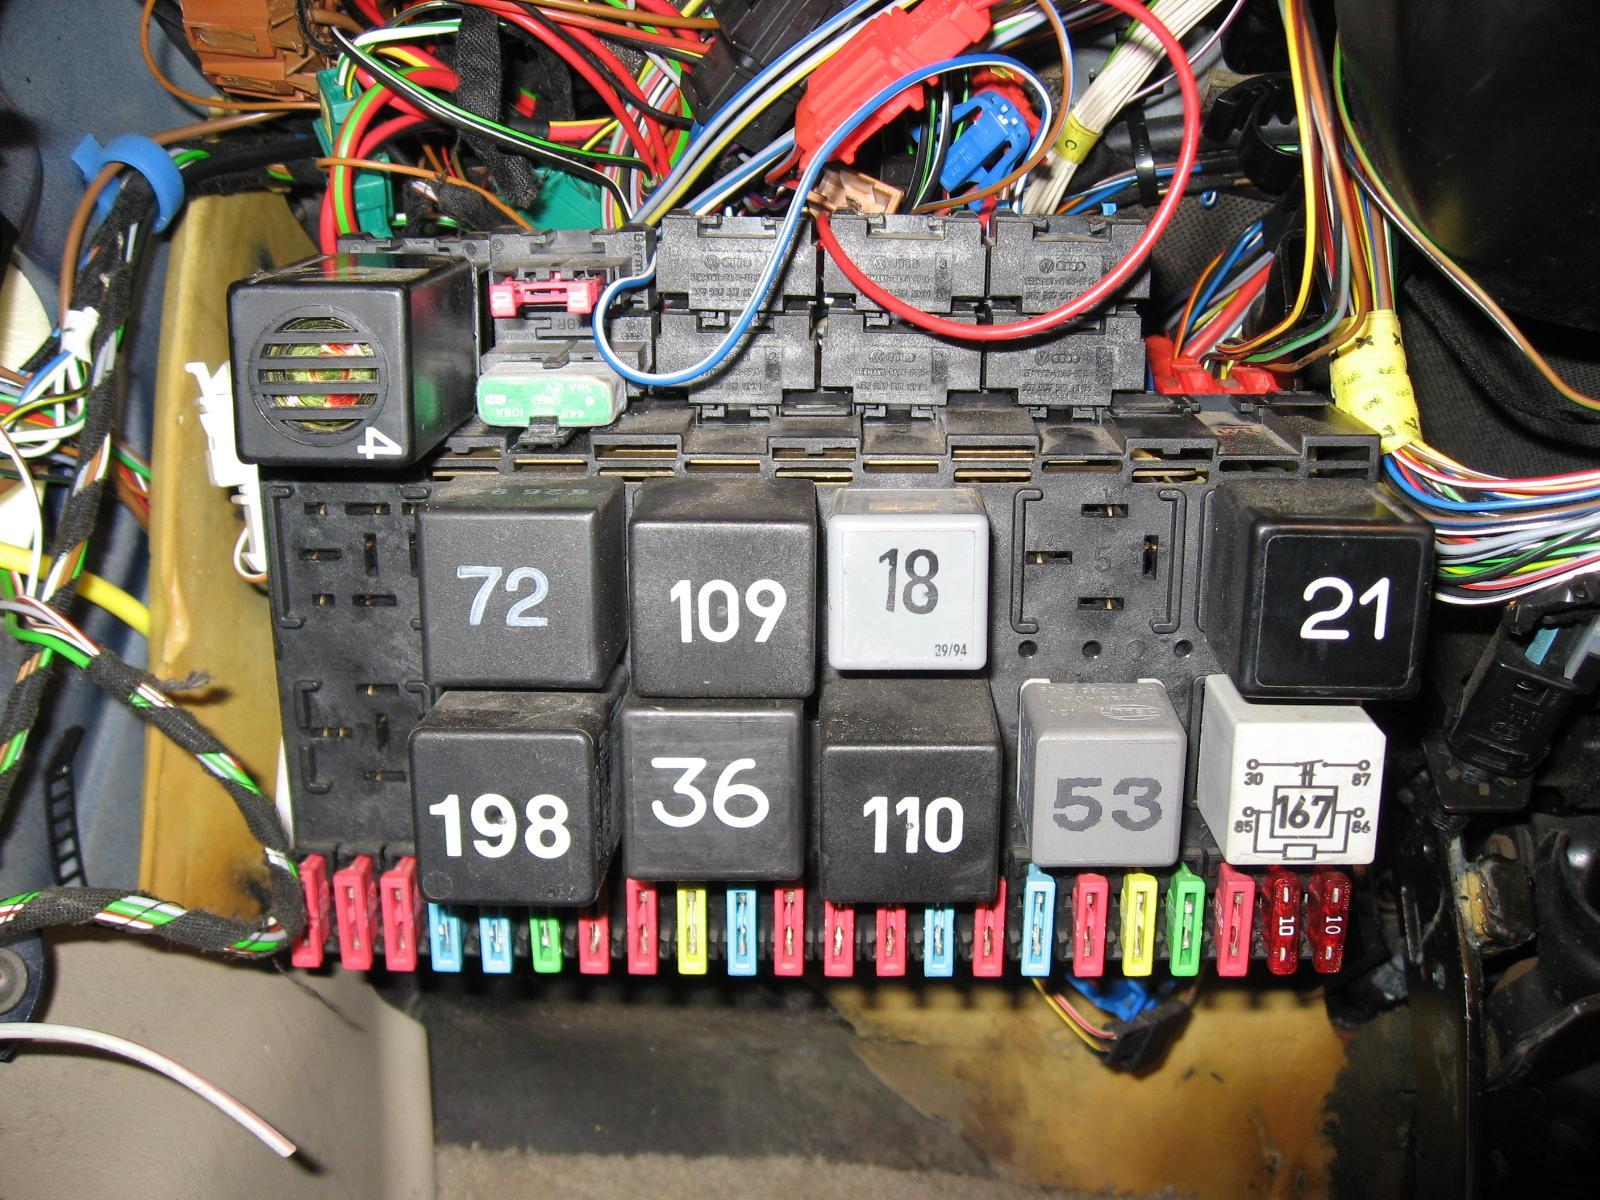 B5 S4 Fuse Diagram Fourtitude Com P5 Passat Into A 98 Golf Wireing Problem